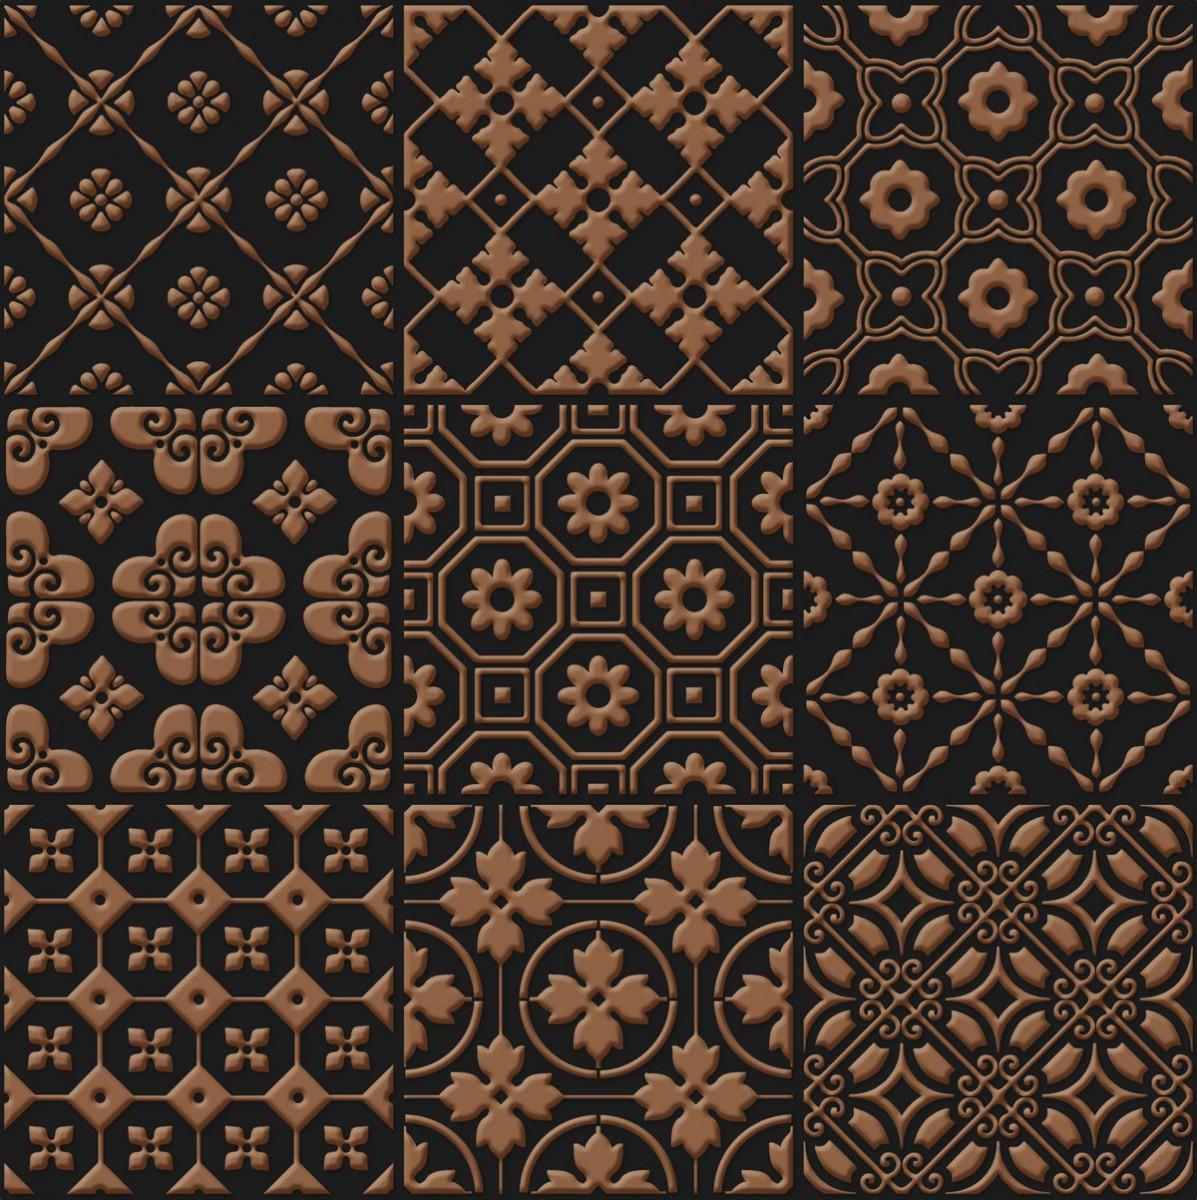 Signorino: Brown on Black